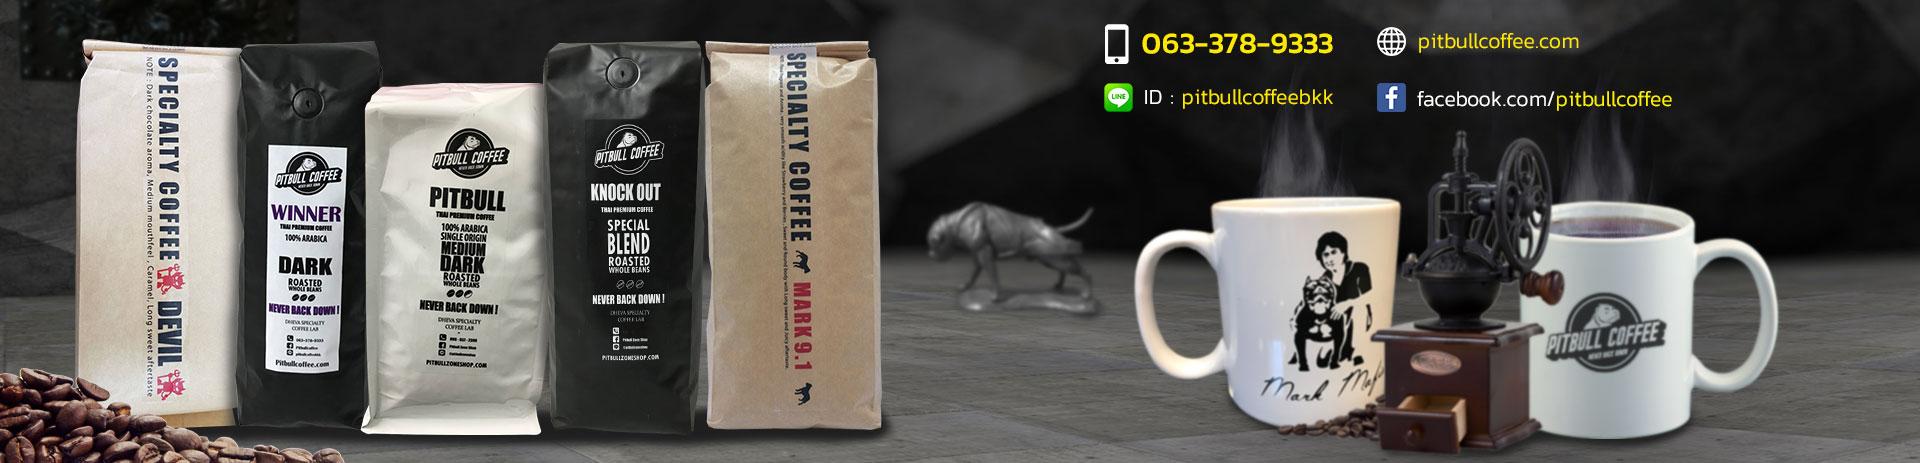 Pitbull Coffee